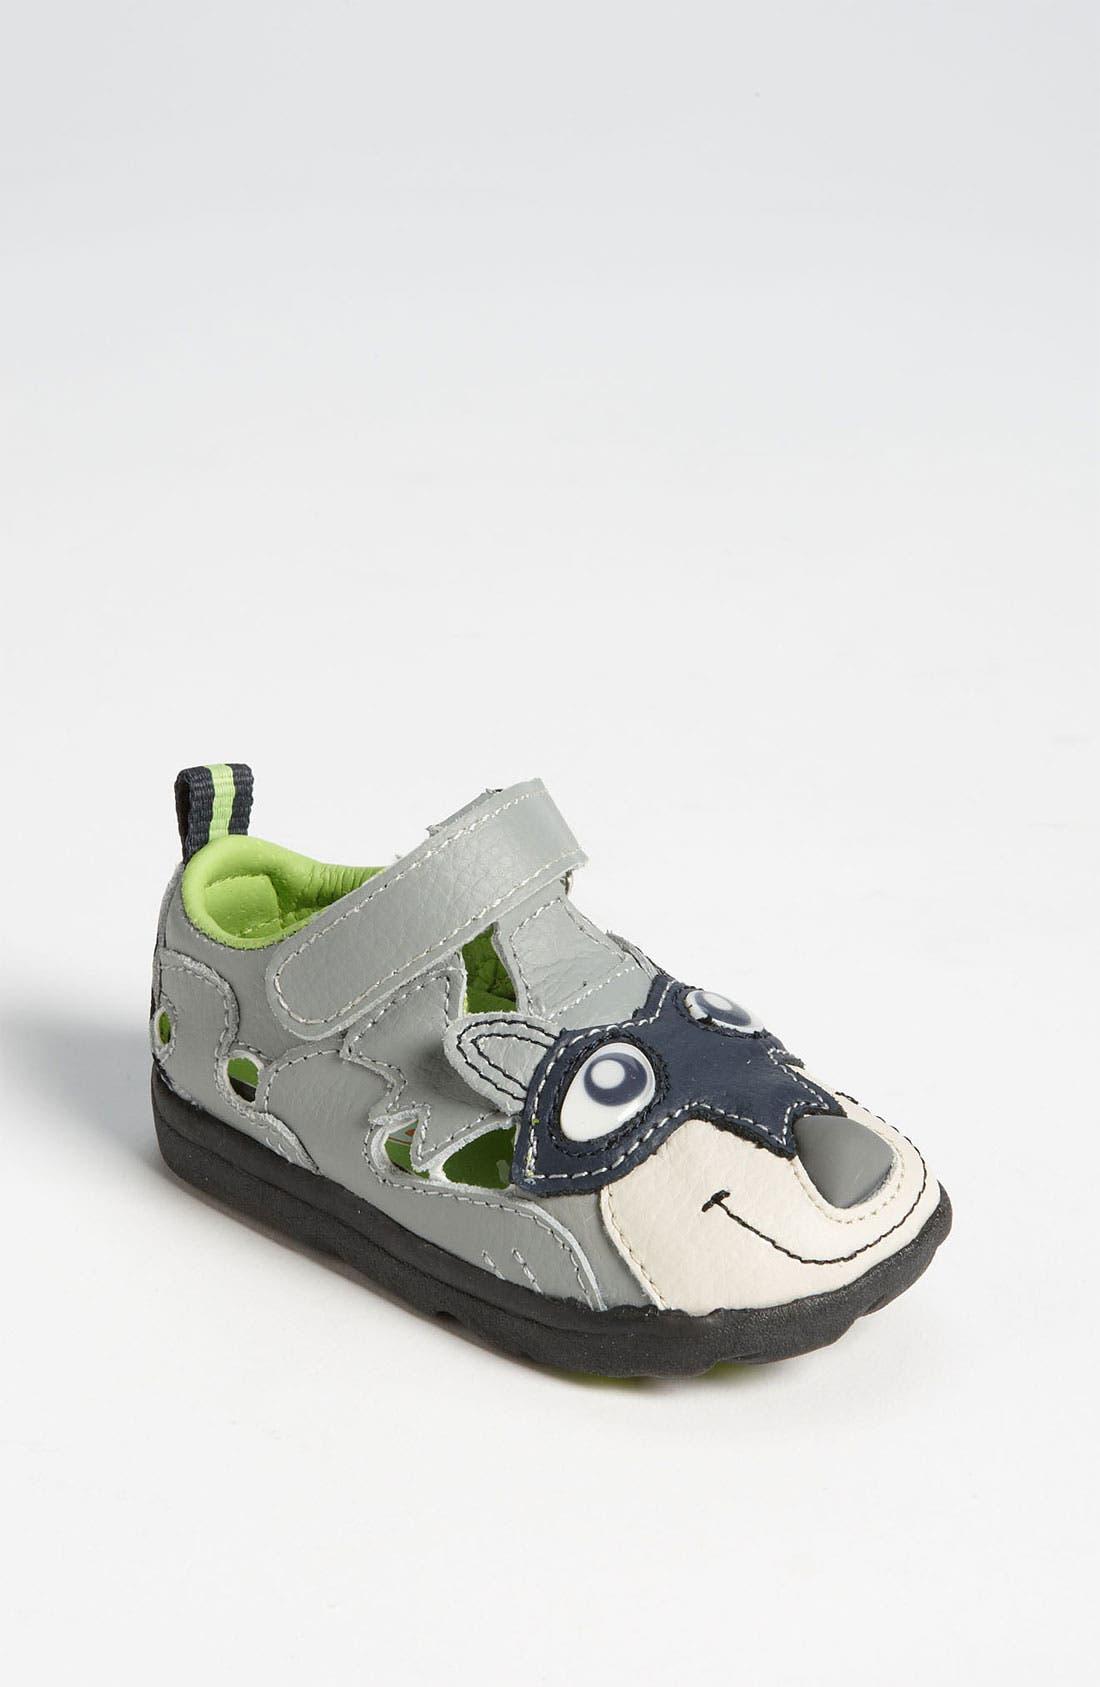 Main Image - Zooligans™ 'Raccoon' Sport Sandal (Baby, Walker & Toddler)